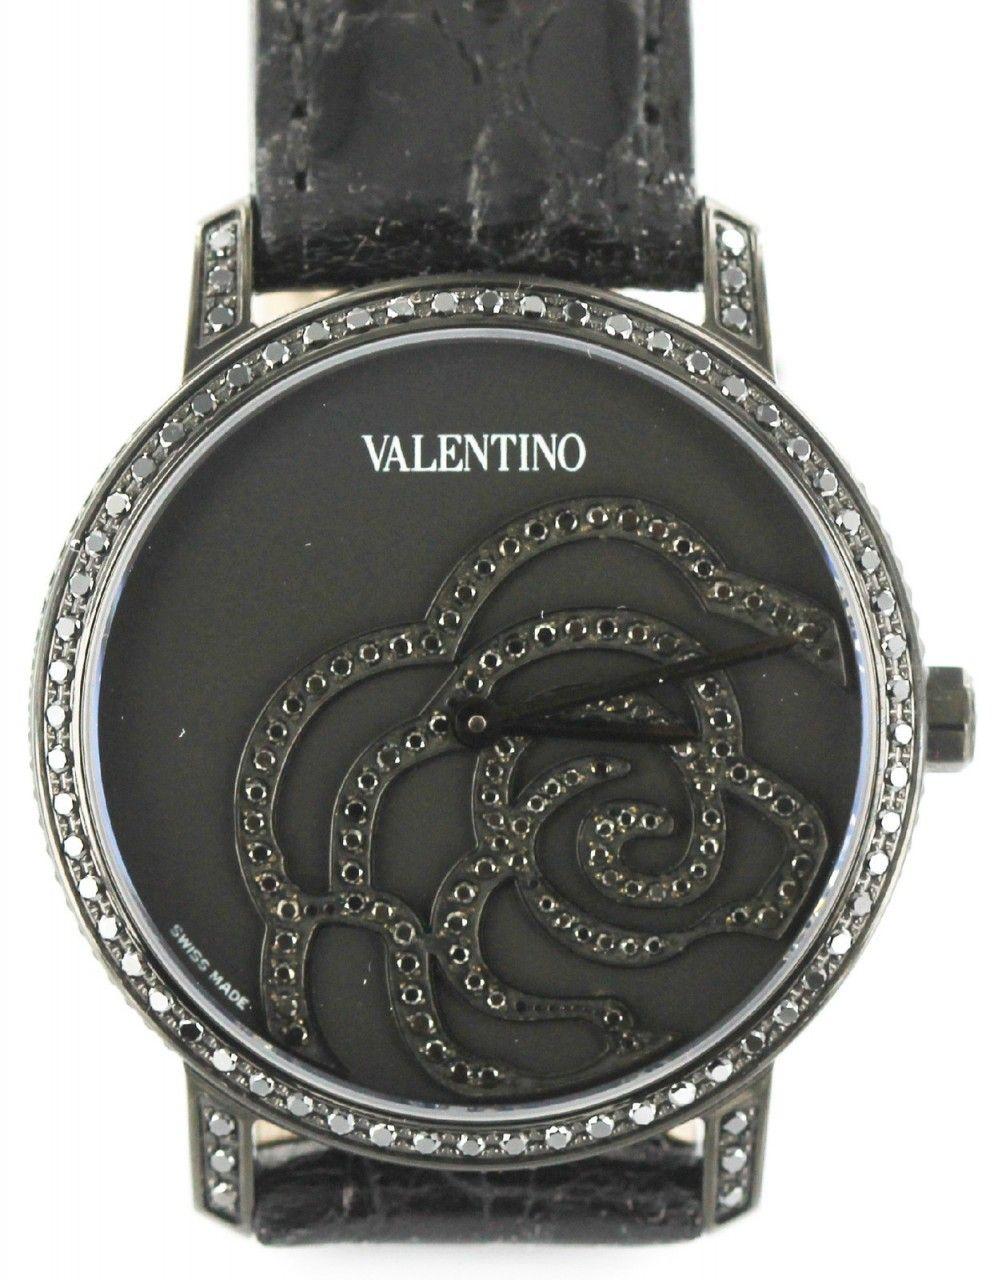 Luxstyle4u - Valentino Watches Crocodile Leather Rose Watch with Black Diamonds in Black - V41SBQ6709SSA09, $2,800.00 (http://www.luxstyle4u.com/valentino-watches-crocodile-leather-rose-watch-with-black-diamonds-in-black-v41sbq6709ssa09/)